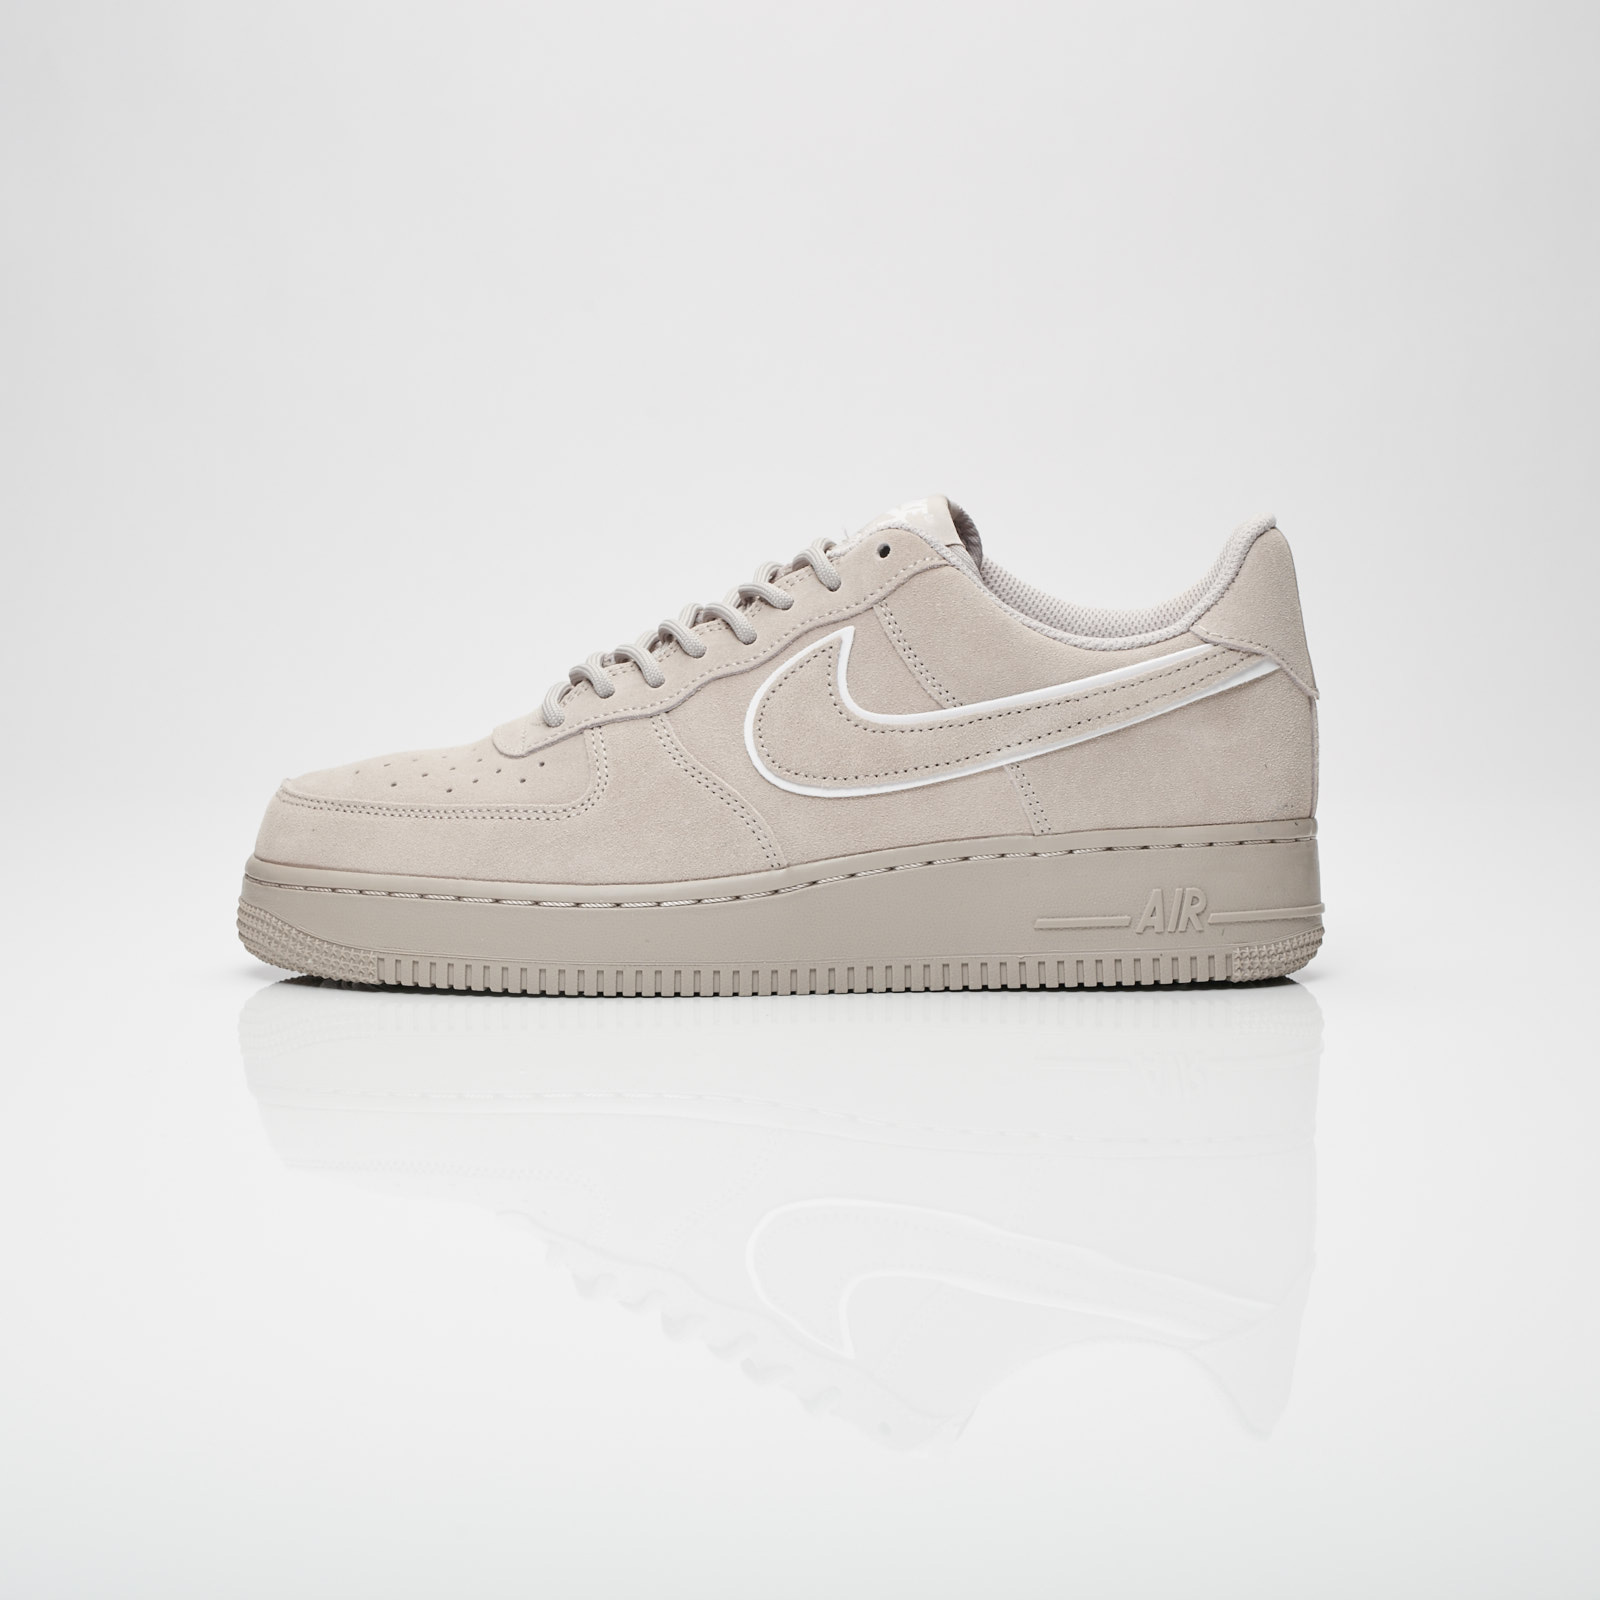 new styles 84d00 cb54f Nike Air Force 1 07 lv8 Suede - Aa1117-201 - Sneakersnstuff   sneakers    streetwear online since 1999